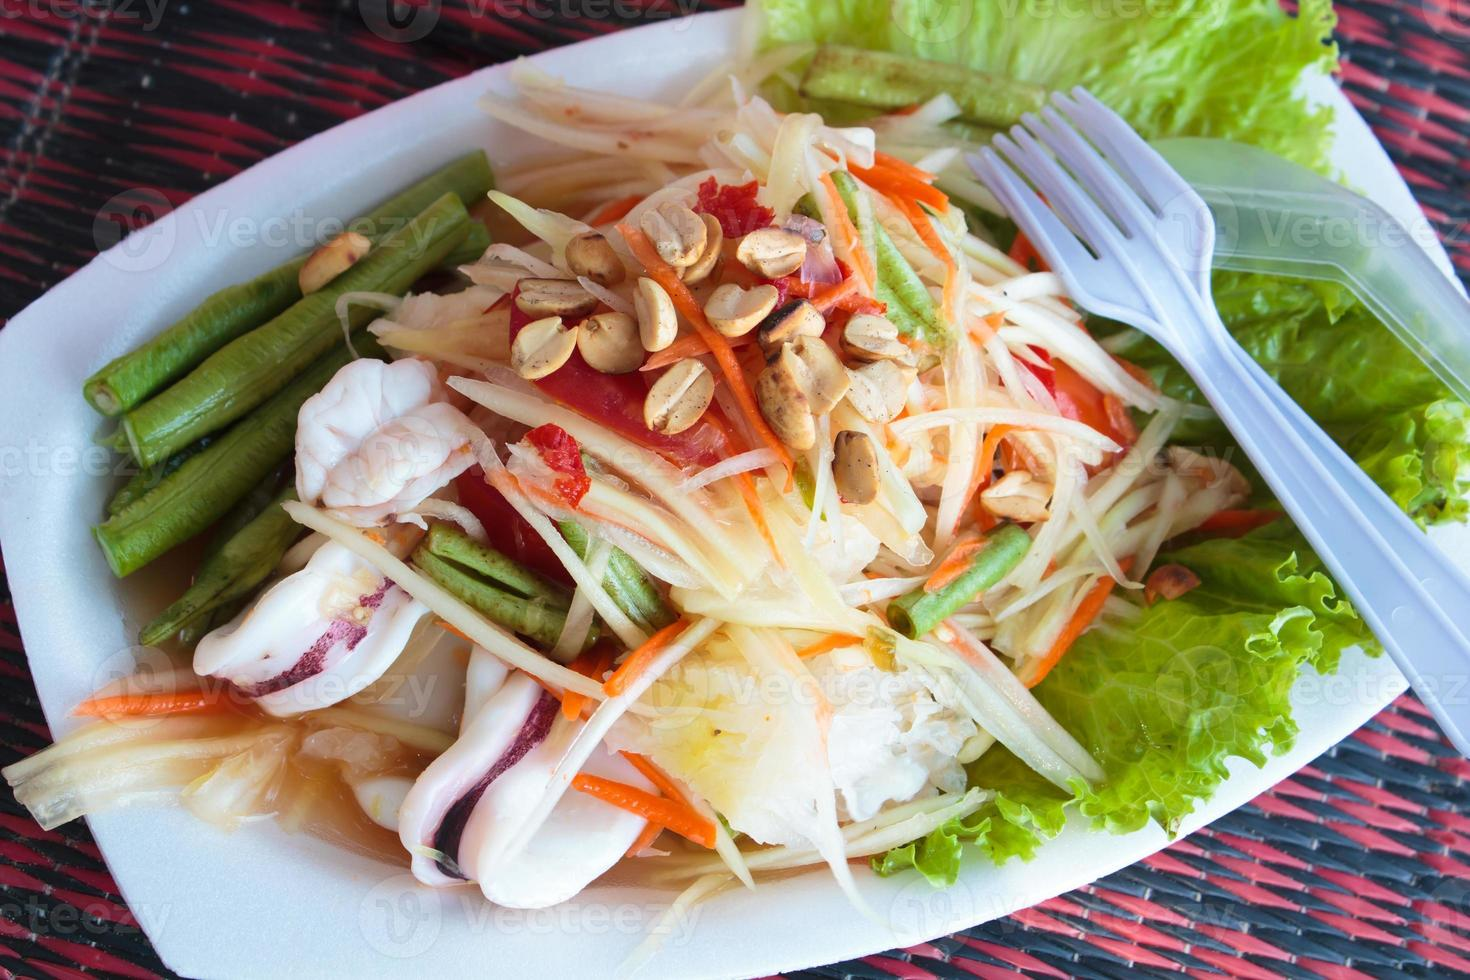 salada de papaia frutos do mar, comida tailandesa. foto